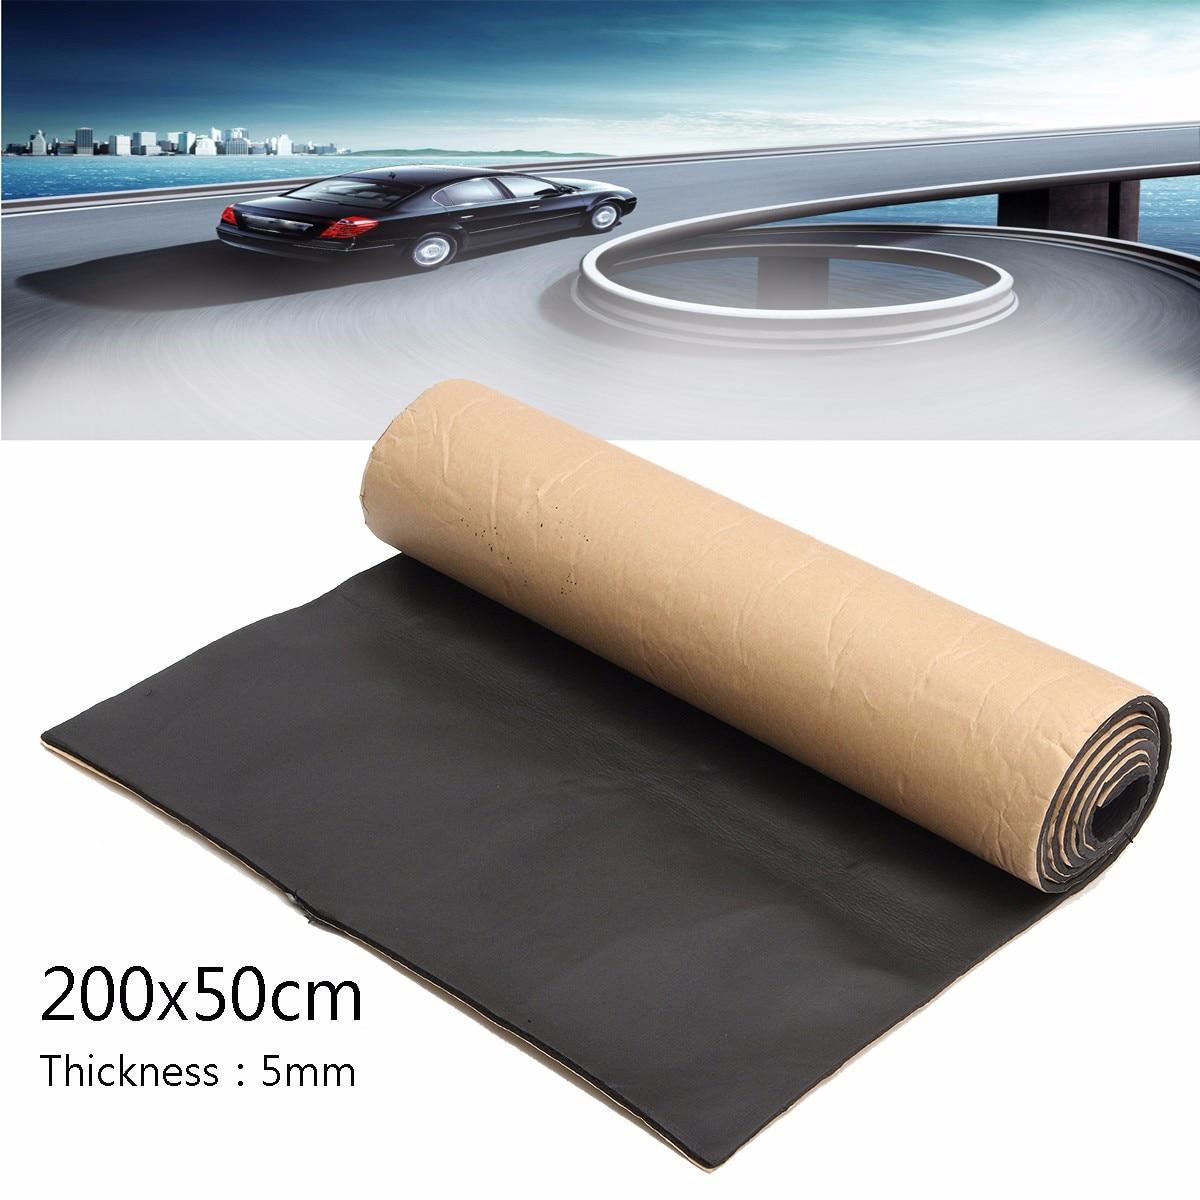 1-roll-200x50cm-36sqft-car-sound-deadening-cotton-heat-insulation-pad-foam-material-automotive-interior-accessories